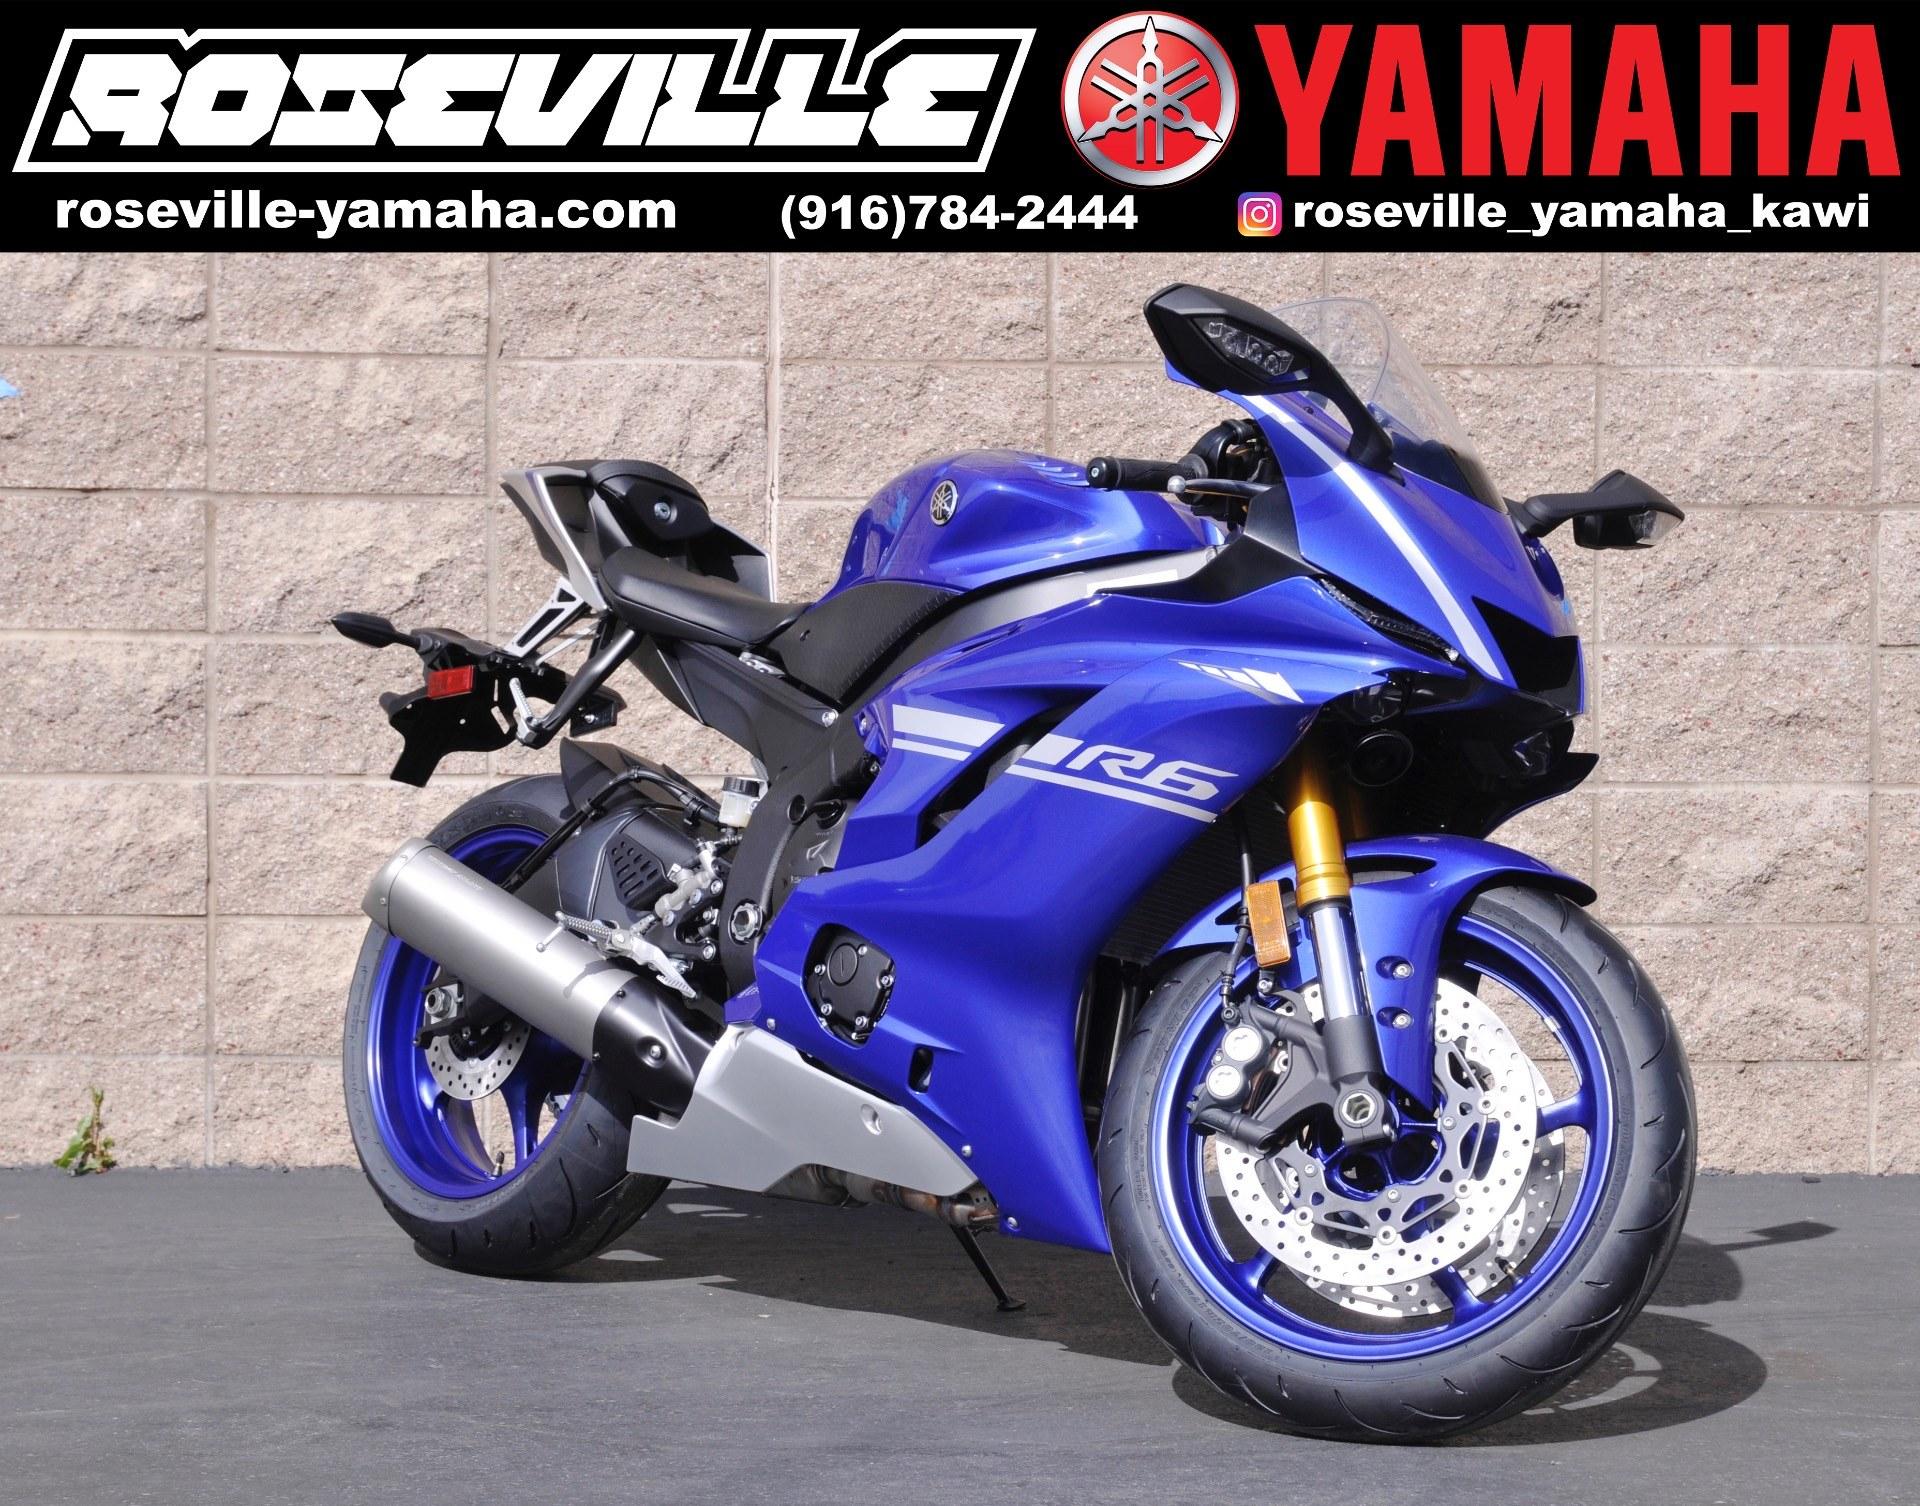 2017 Yamaha YZF-R6 in Roseville, California